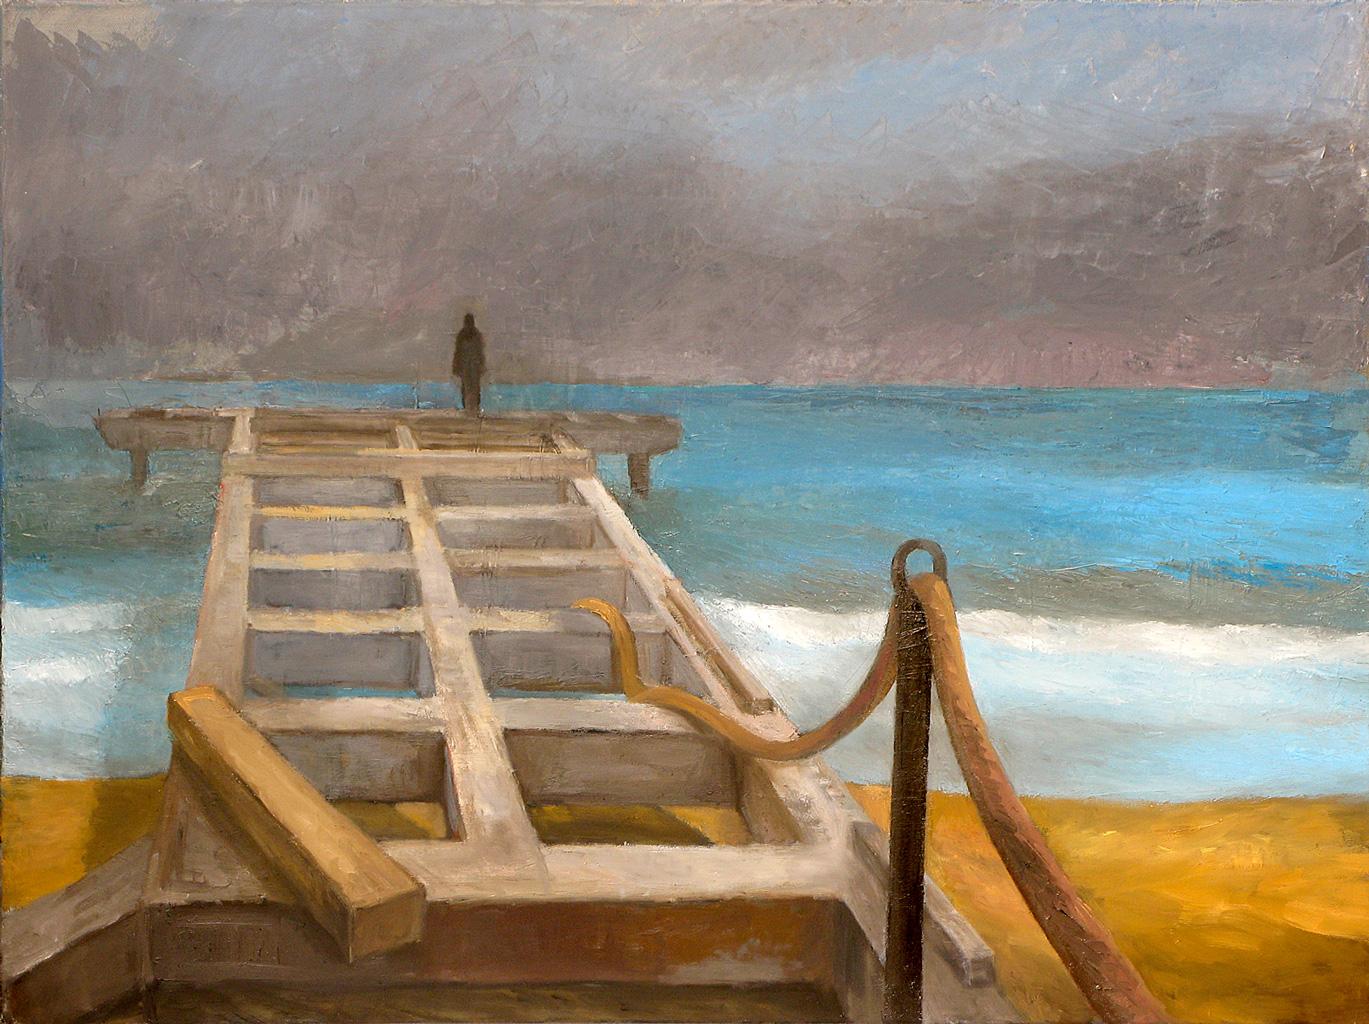 Gabi Keil, Warten I (Lido), Öl auf LW, 60 x 80 cm, 2013